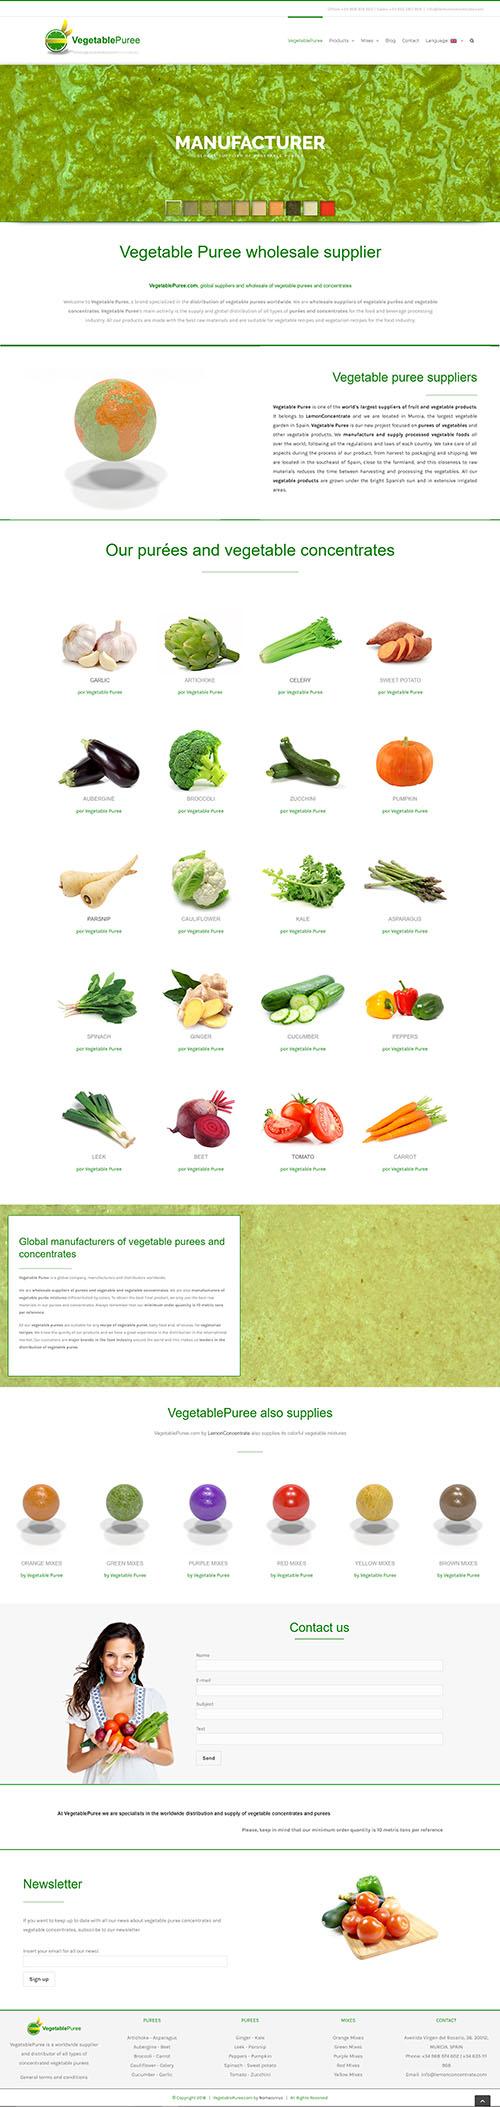 VegetablePuree - Desarrollo web a medida